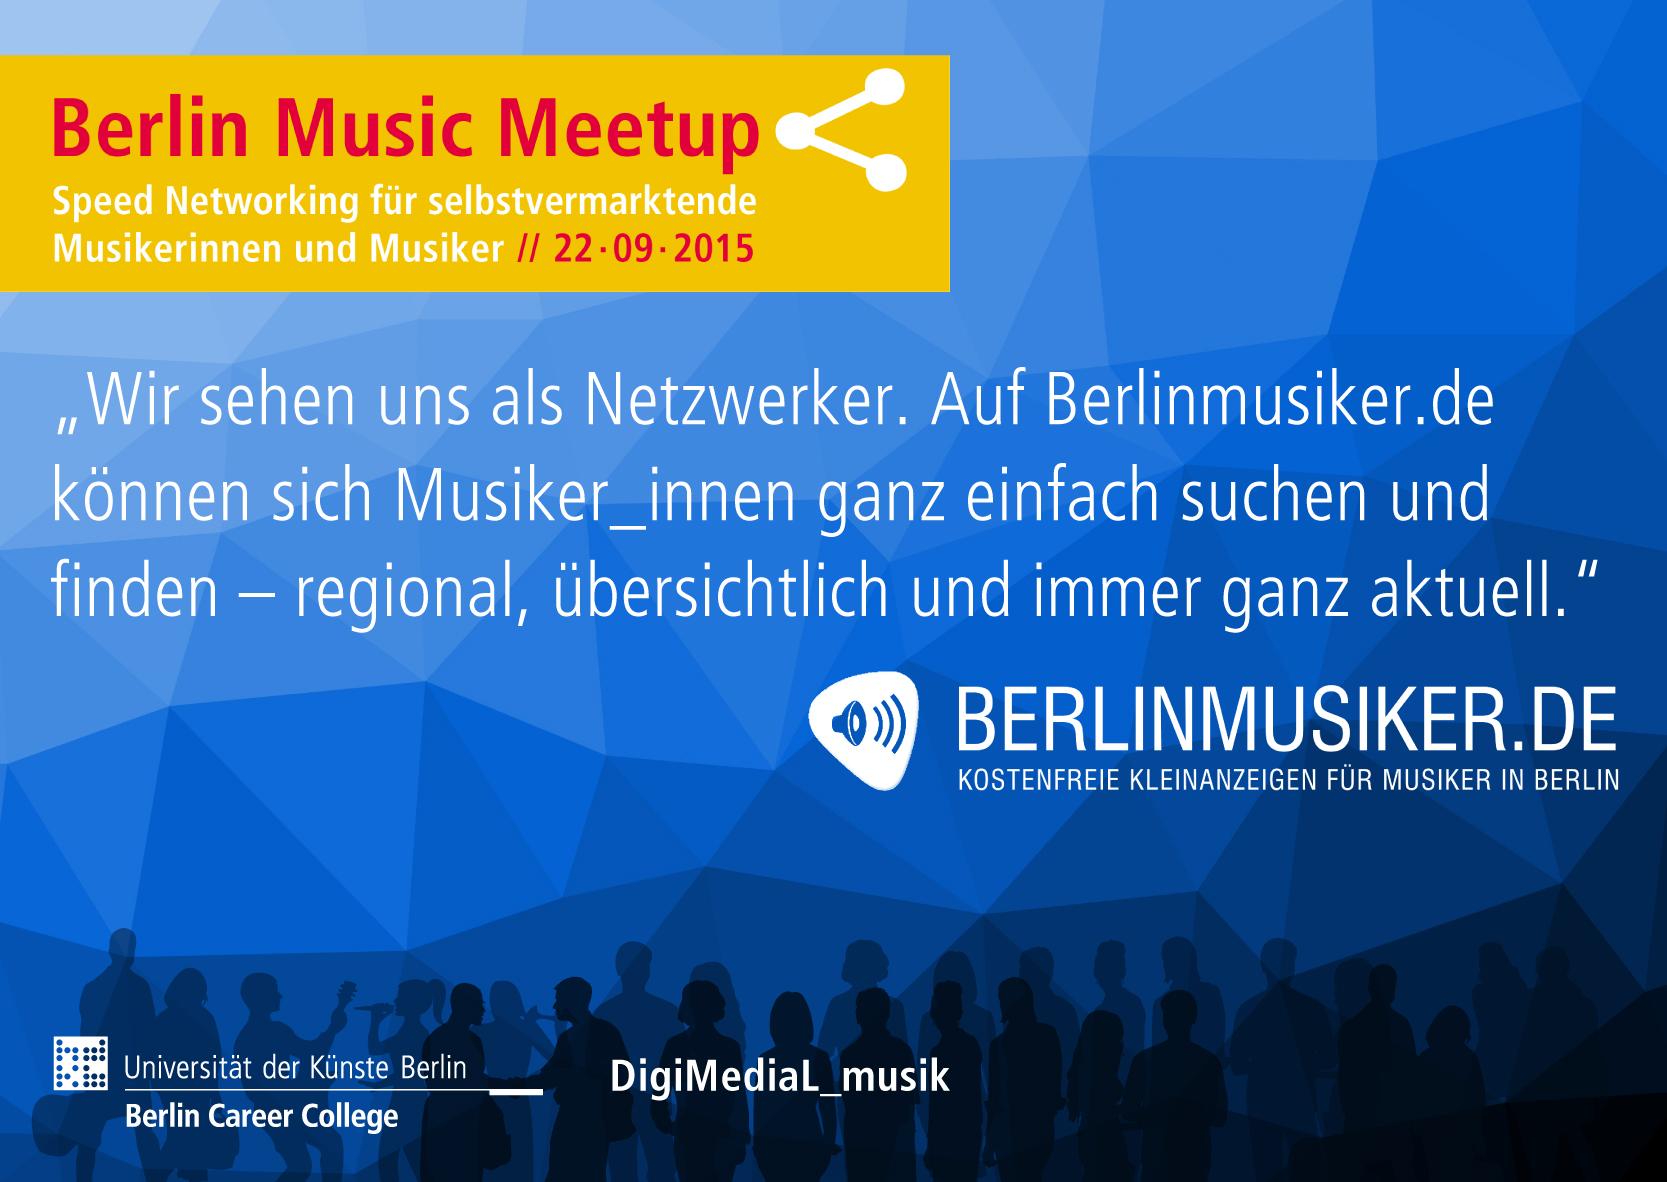 berlin_music_meetup_web_flyer_brrlinmusiker